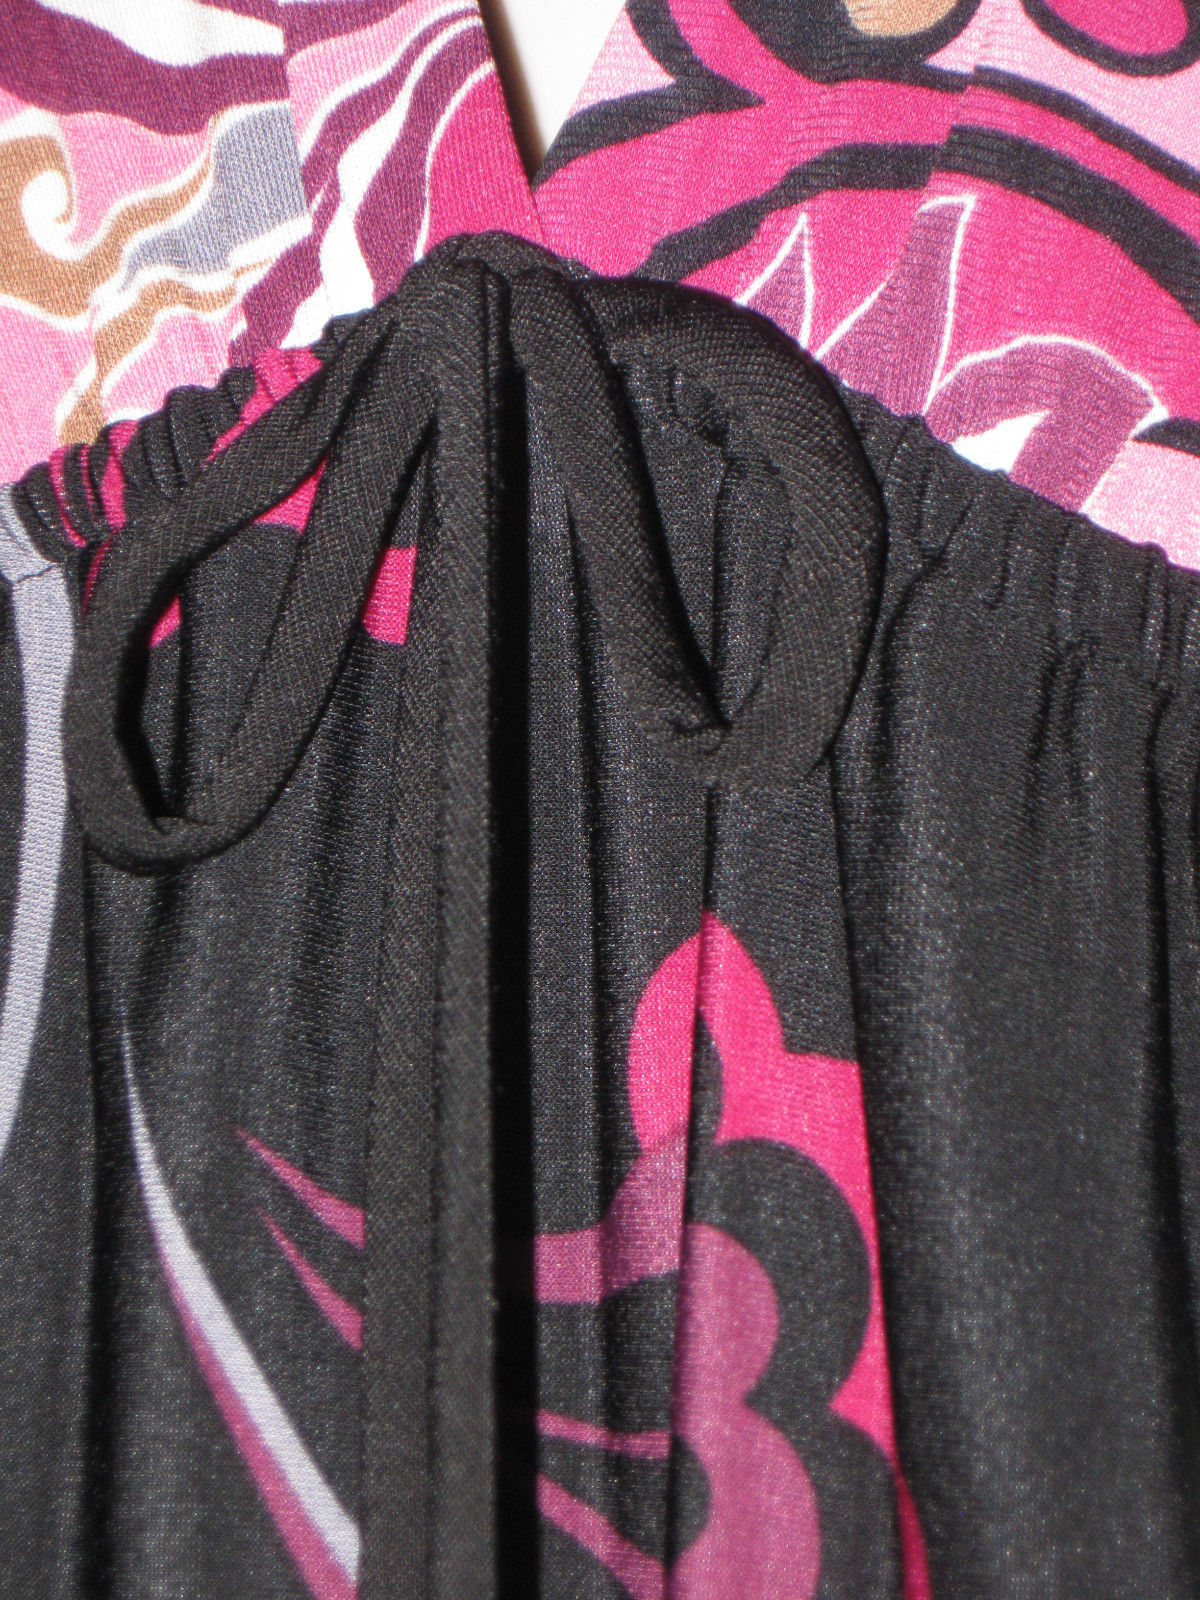 0693ac0010f0e6 M RHAPSODY V-Neckline Stylish Vintage Black Pink Swirl Floral Design Midi  Dress